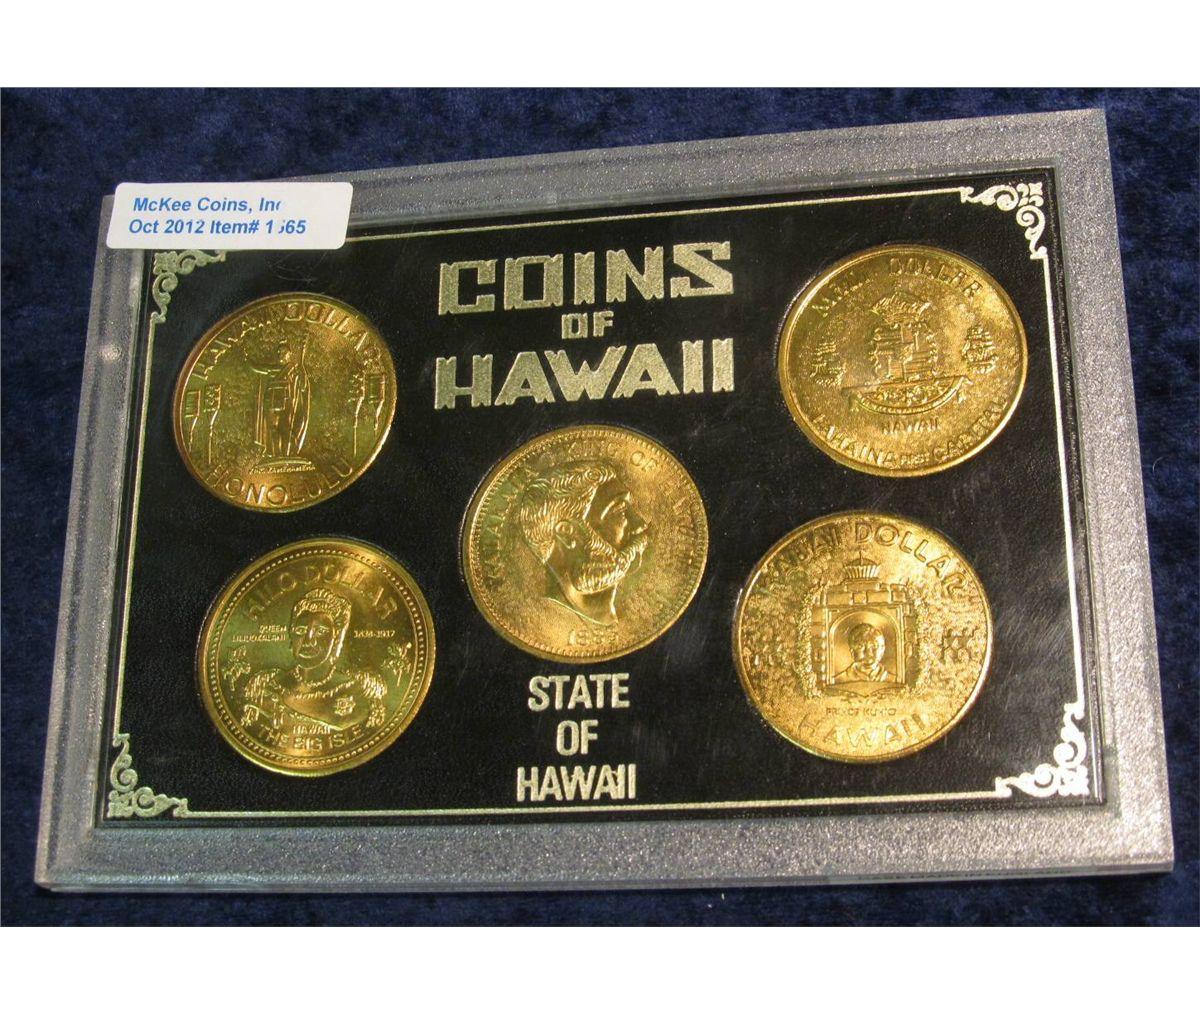 1565  Five Coin Set of Hawaii Souvenir Dollars in a custom plastic case